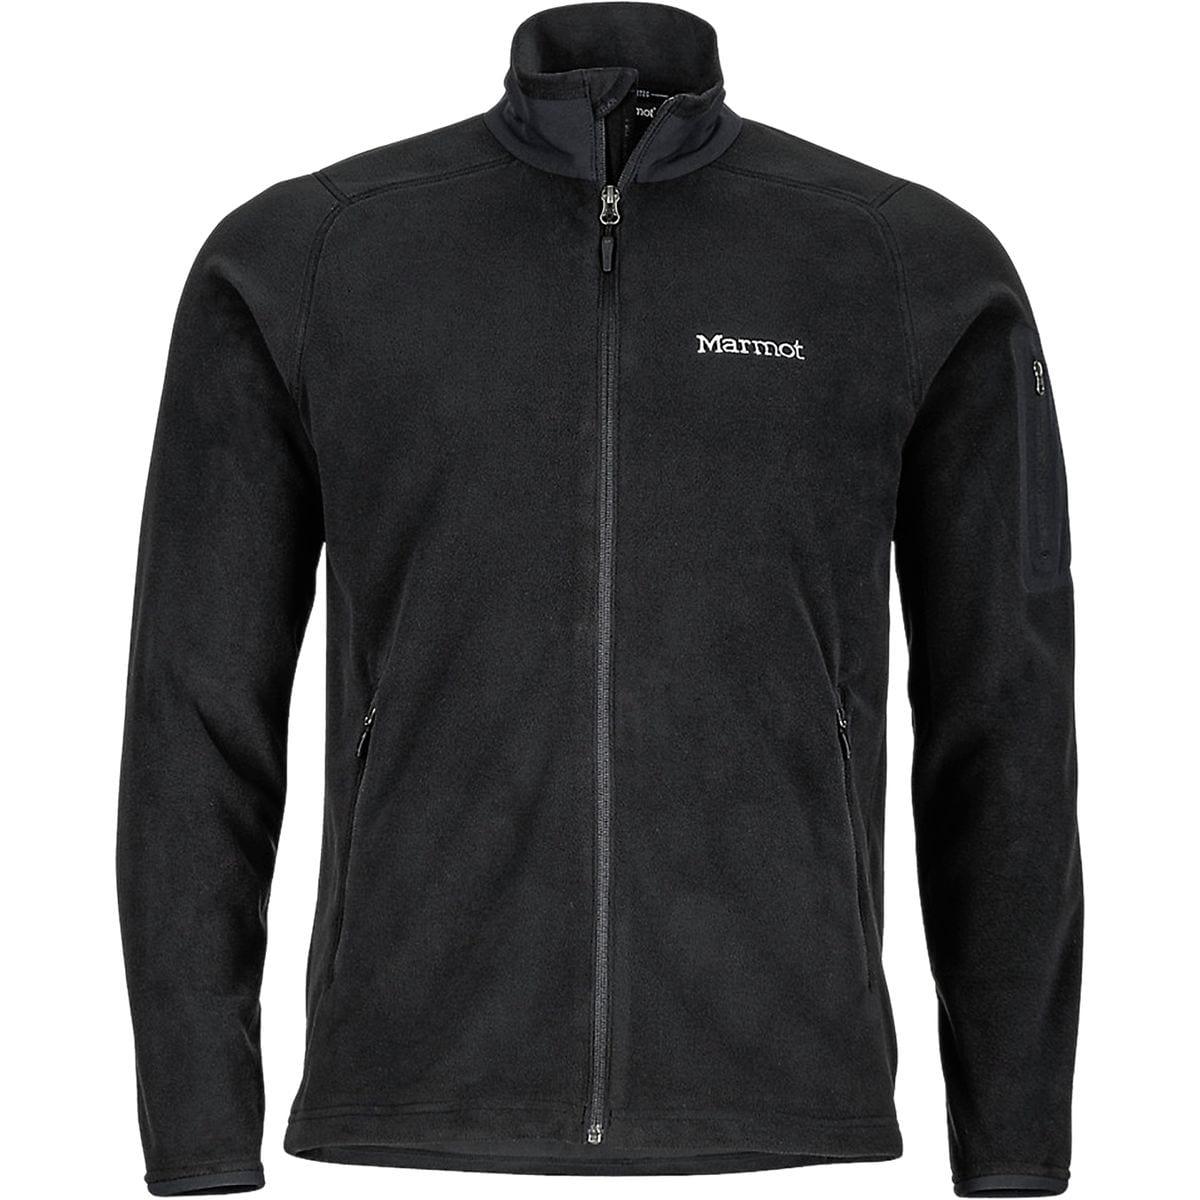 Marmot Reactor Fleece Jacket - Black